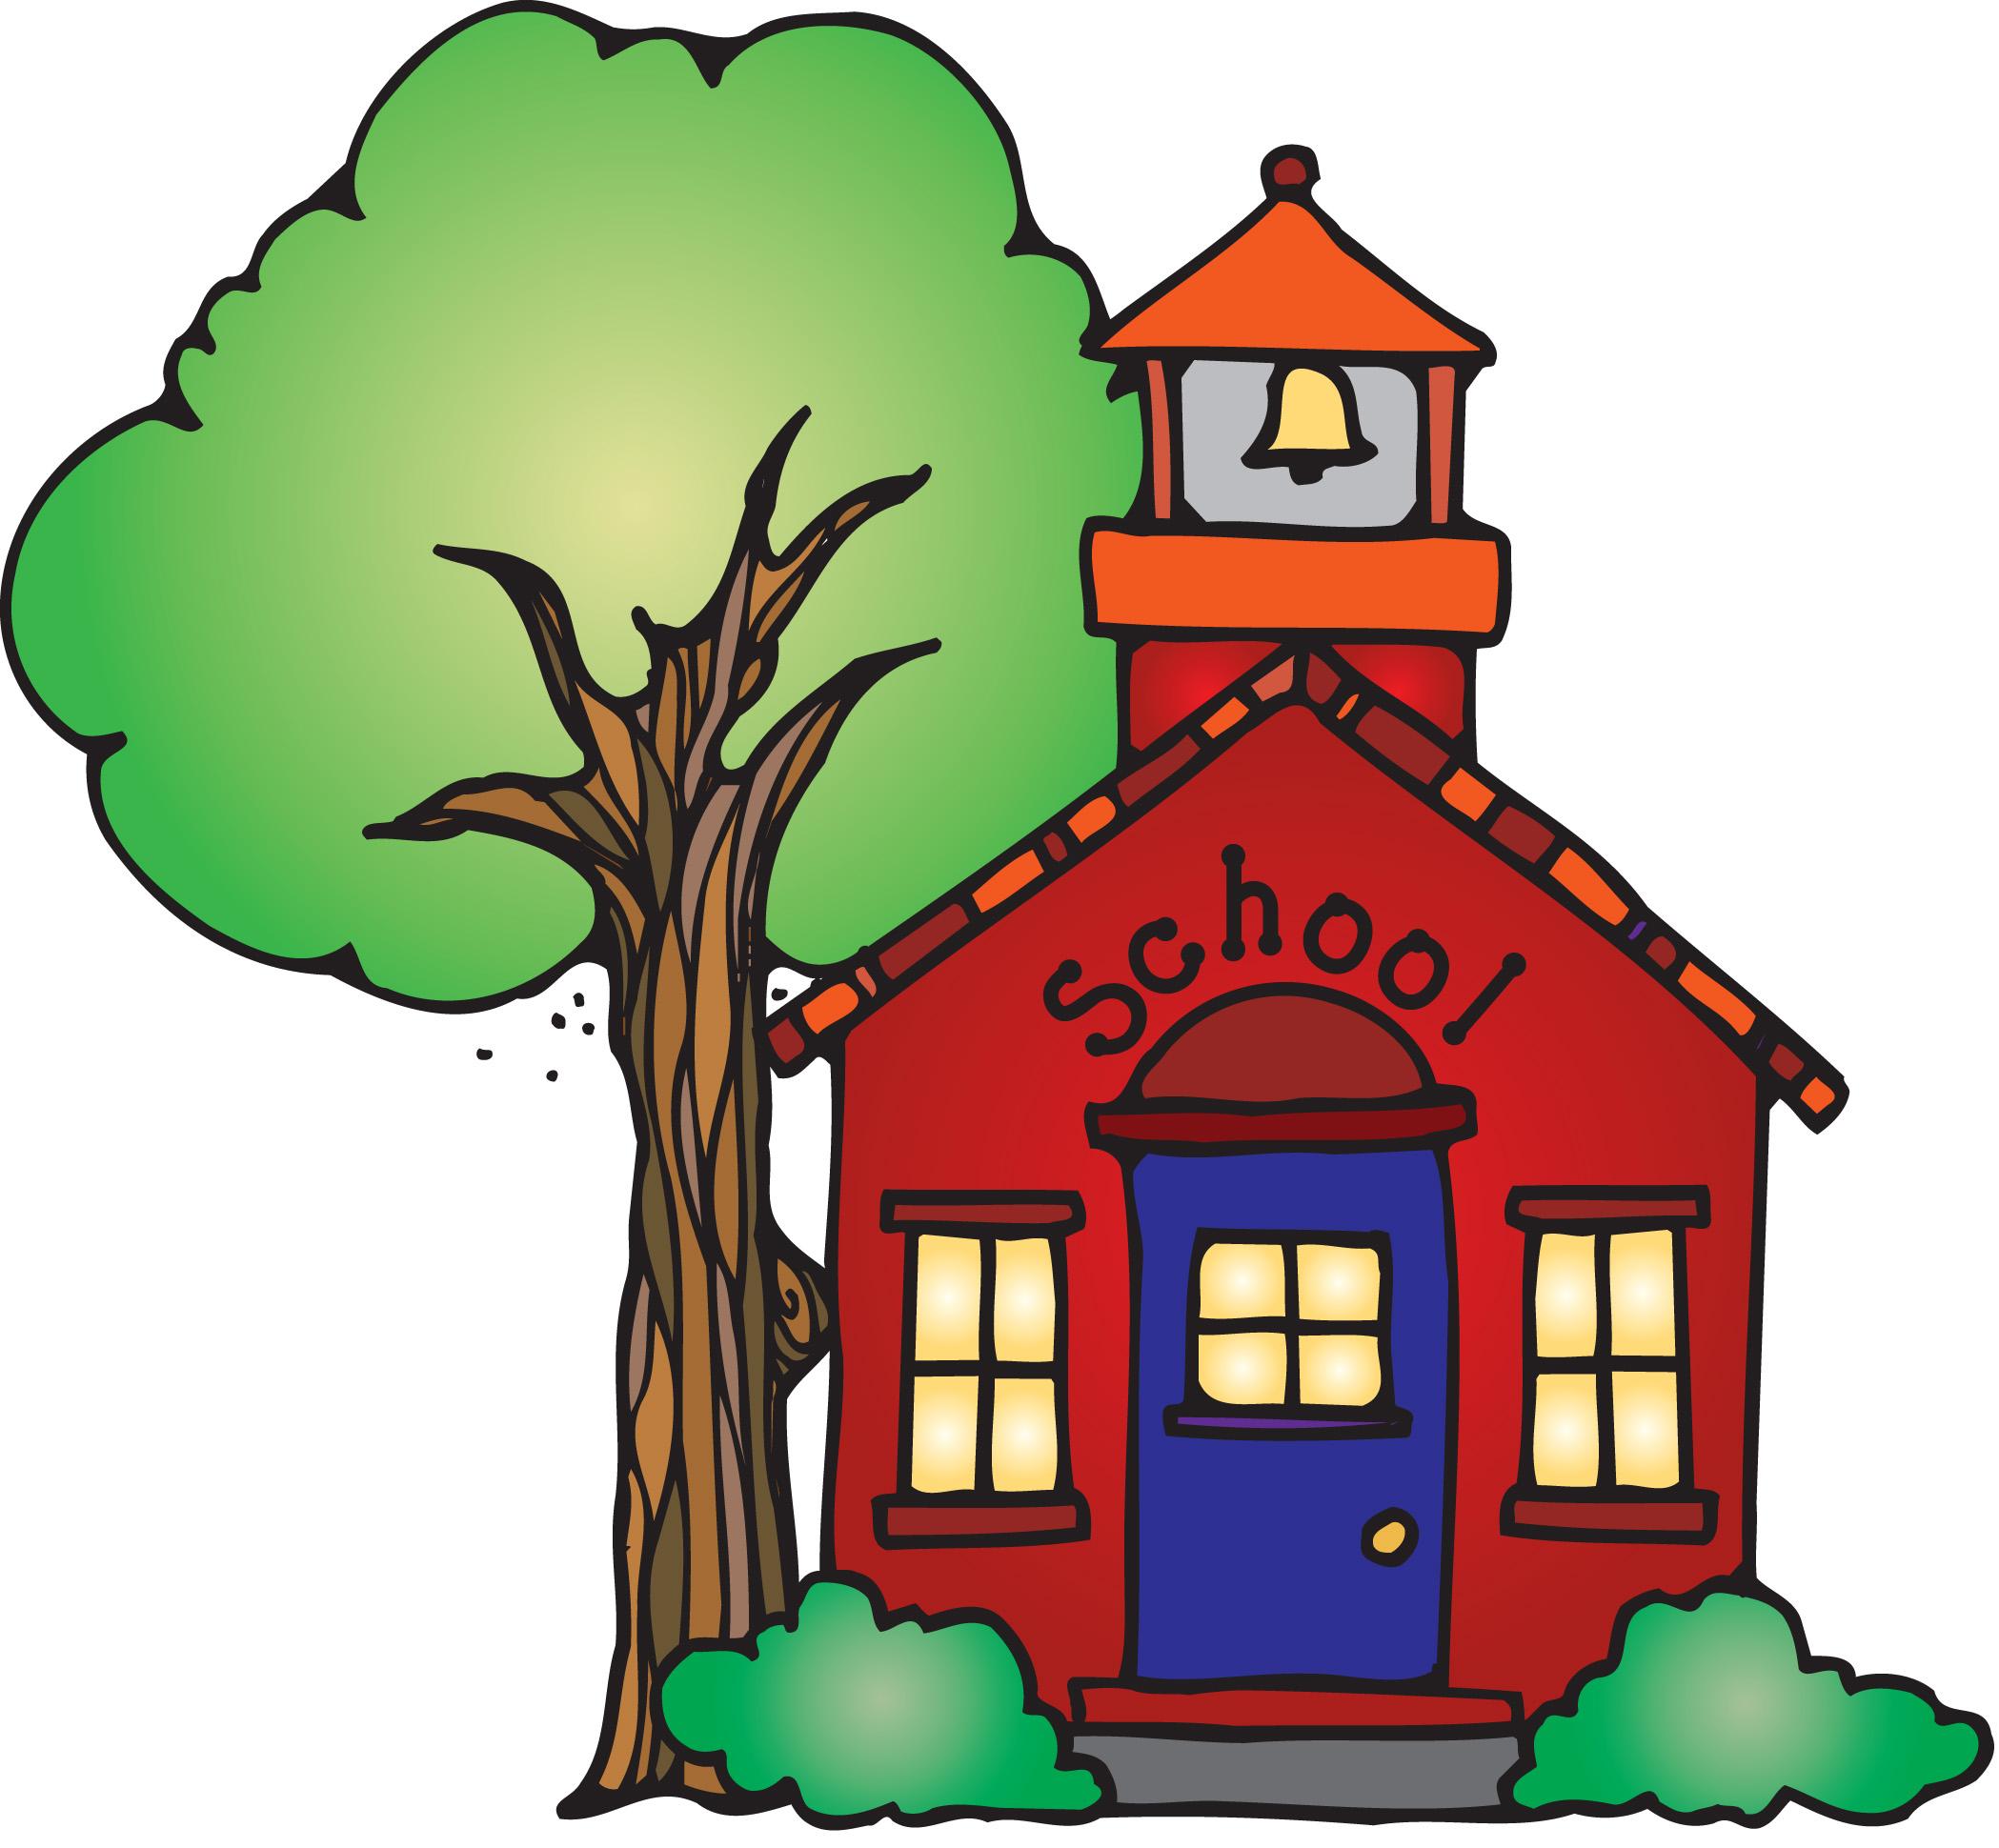 School house images panda. Free schoolhouse clipart